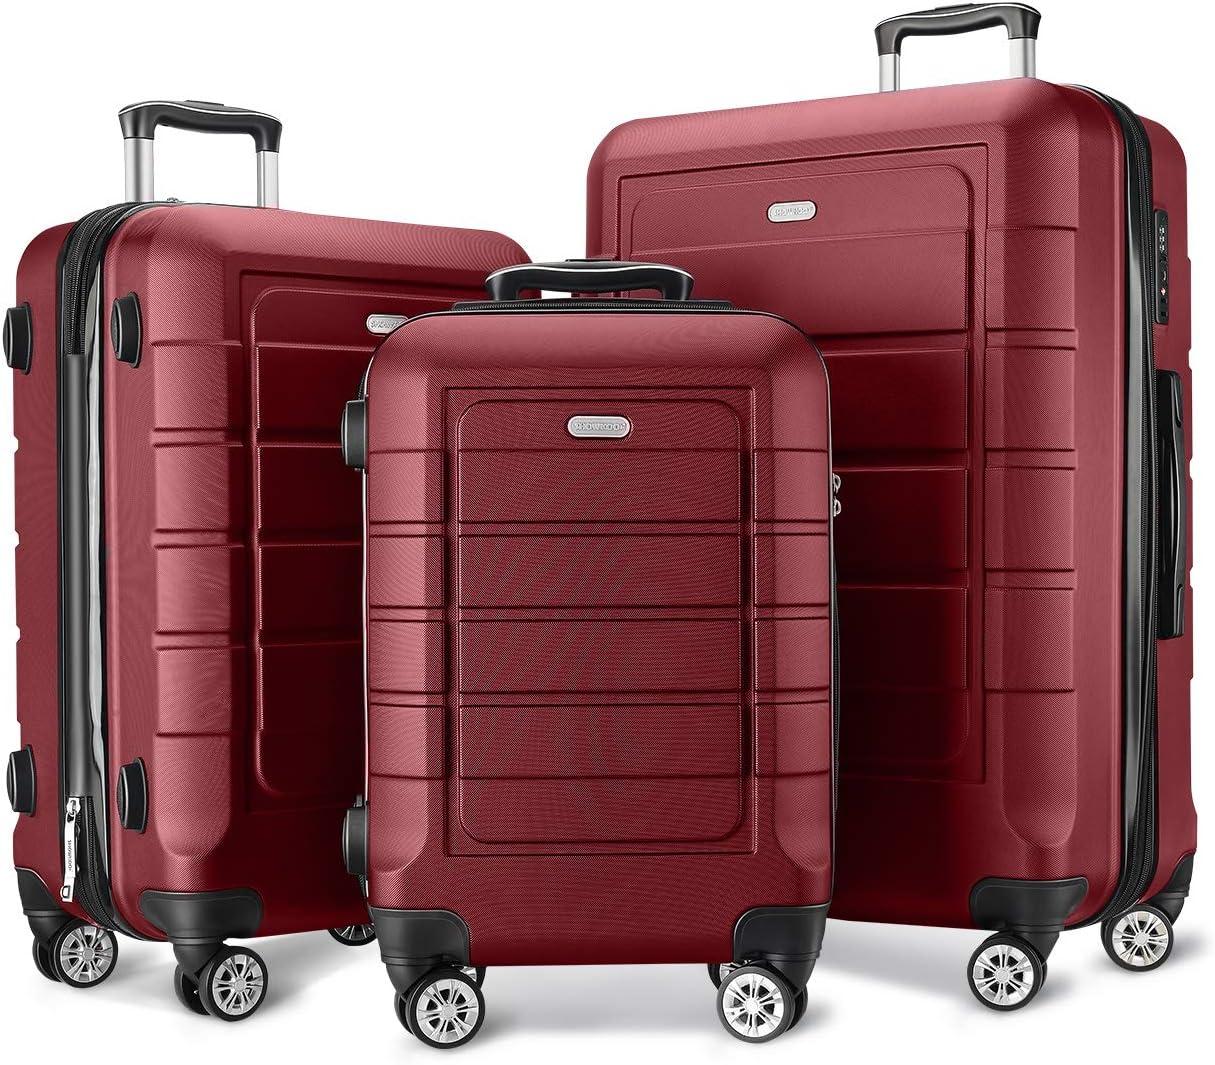 SHOWKOO Luggage Sets Expandable PC+ABS Durable Suitcase Double Wheels TSA Lock 3pcs Red Wine